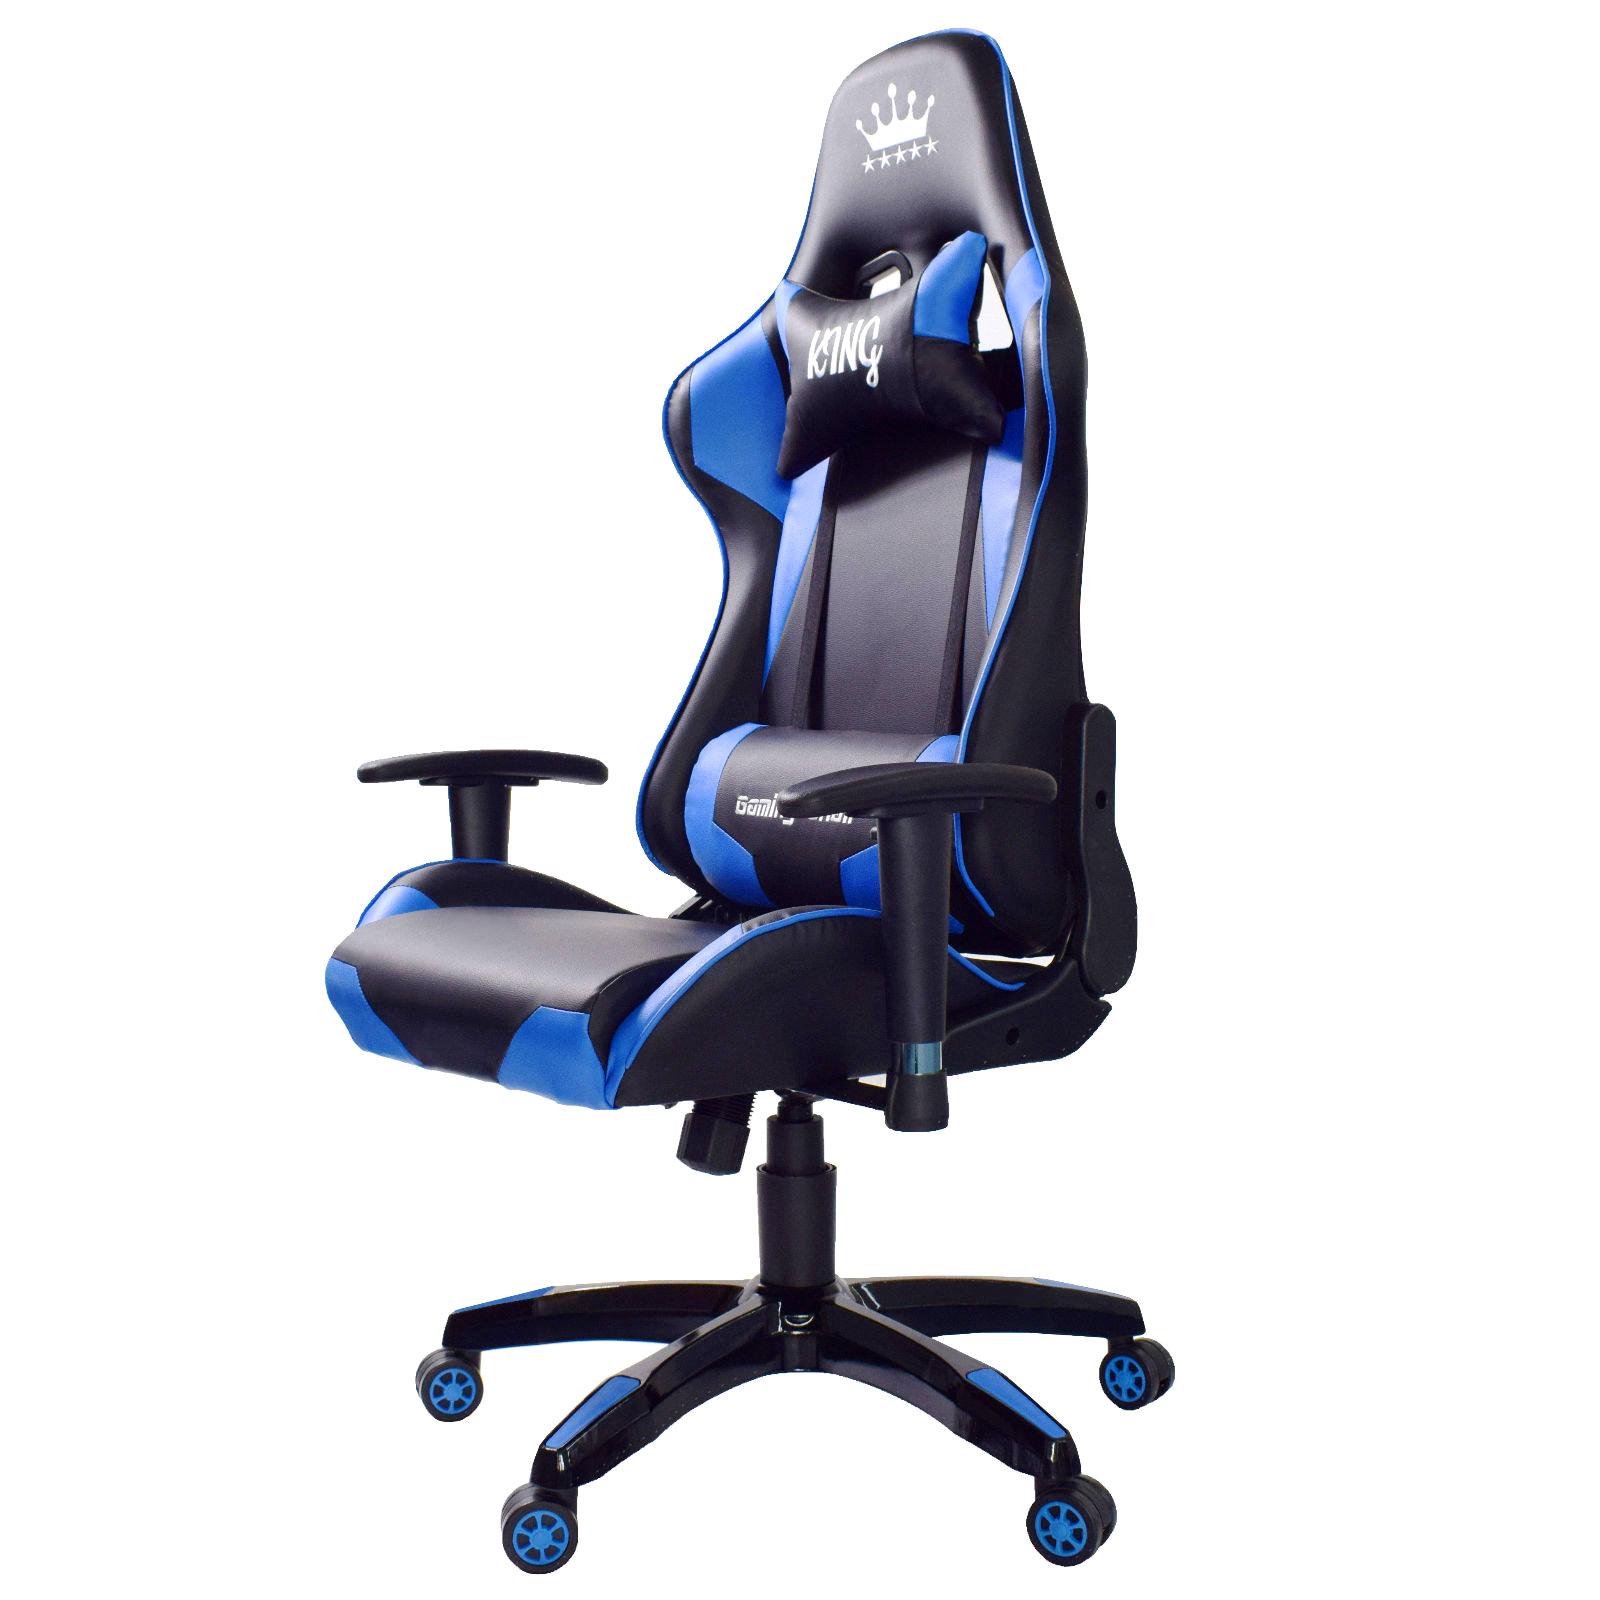 Sportsitz Racing Stuhl Bürostuhl Chefsessel Drehstuhl Midori Gaming WHYDEI29